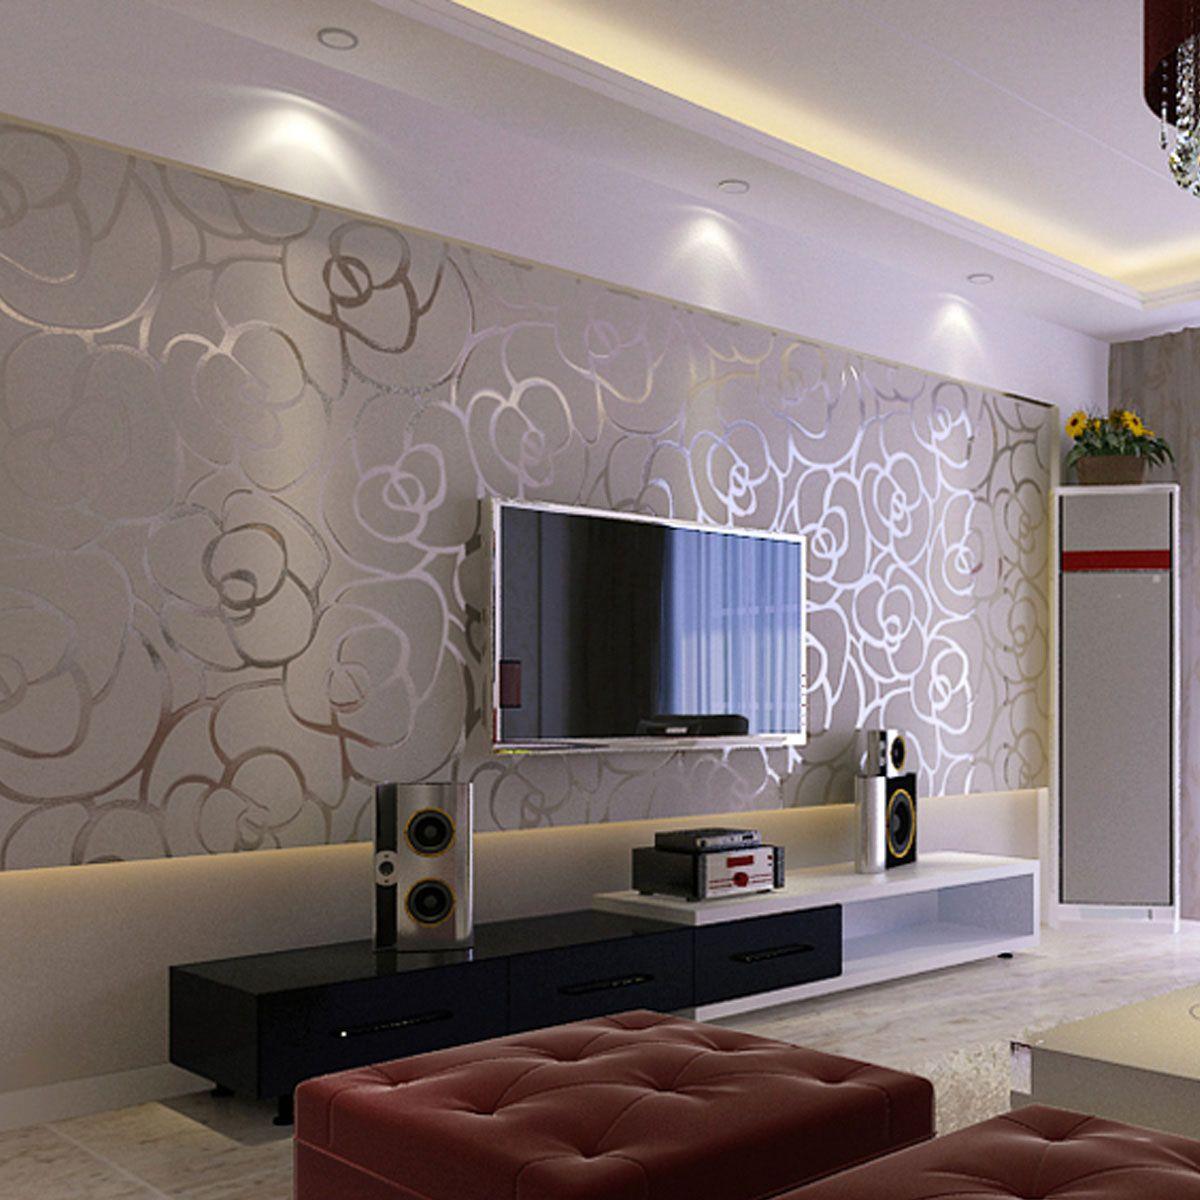 Papel de parede para sala de estar chique